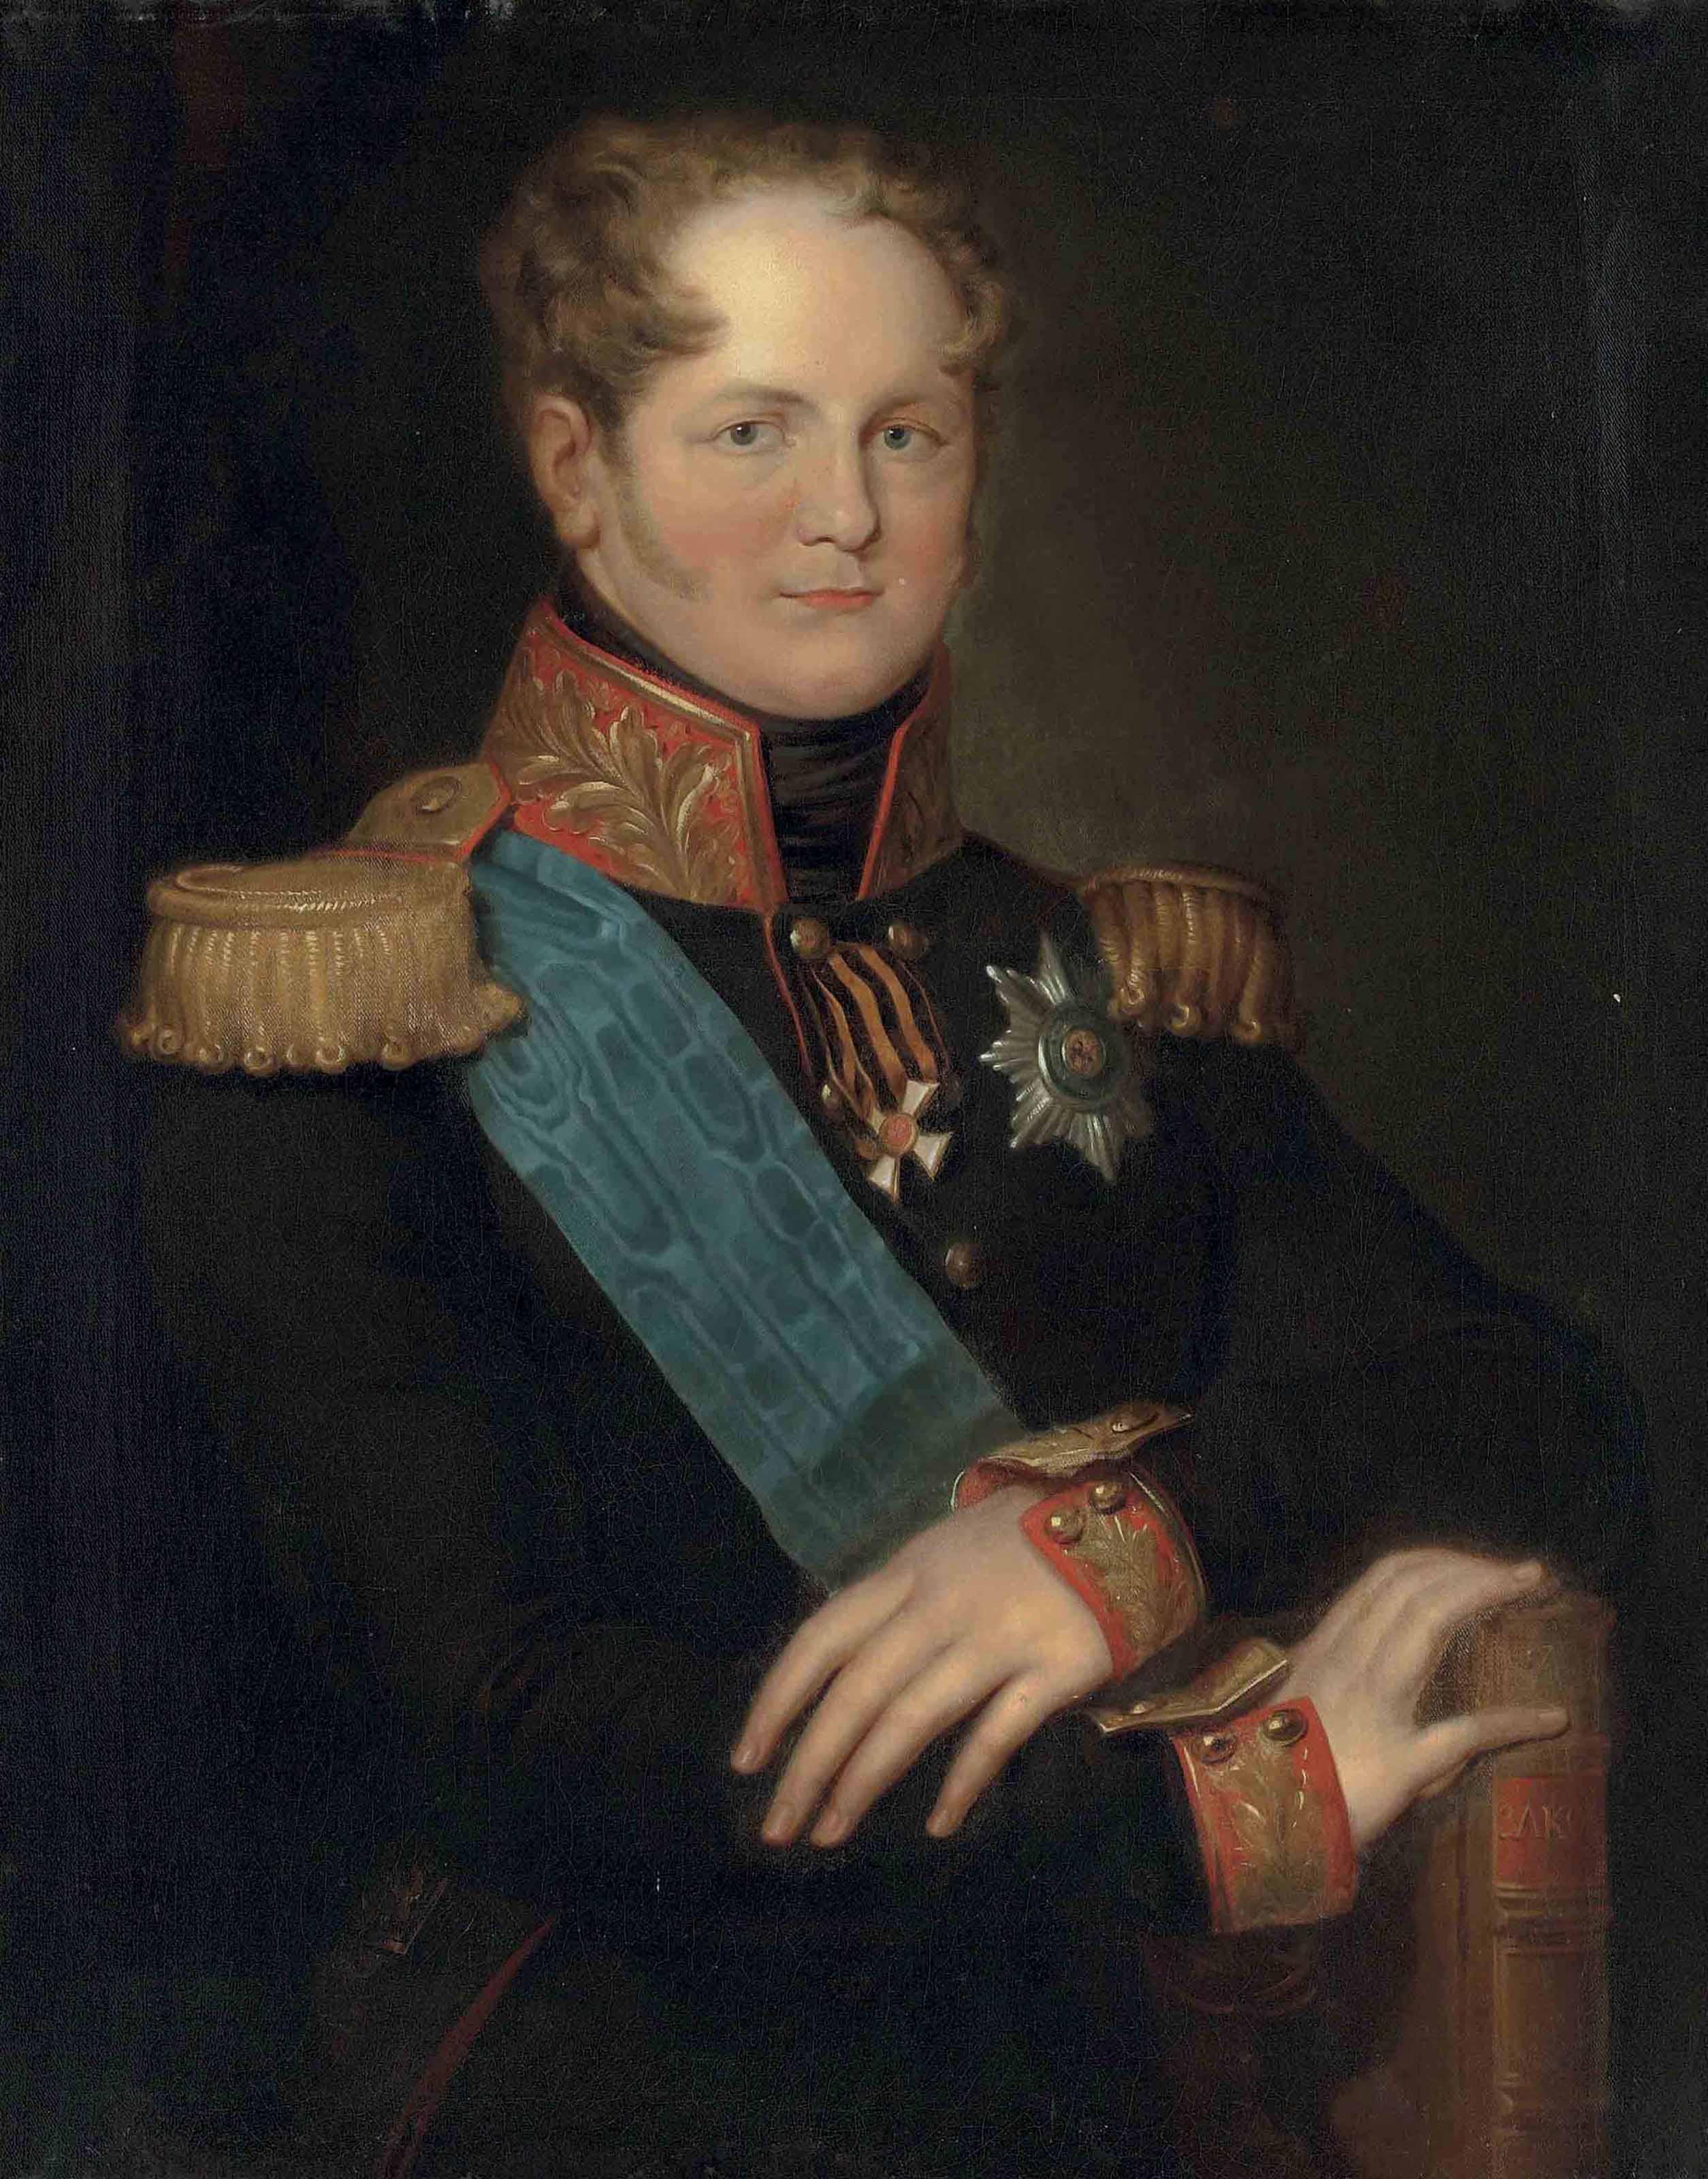 Portrait of Alexander I (1777-1825)